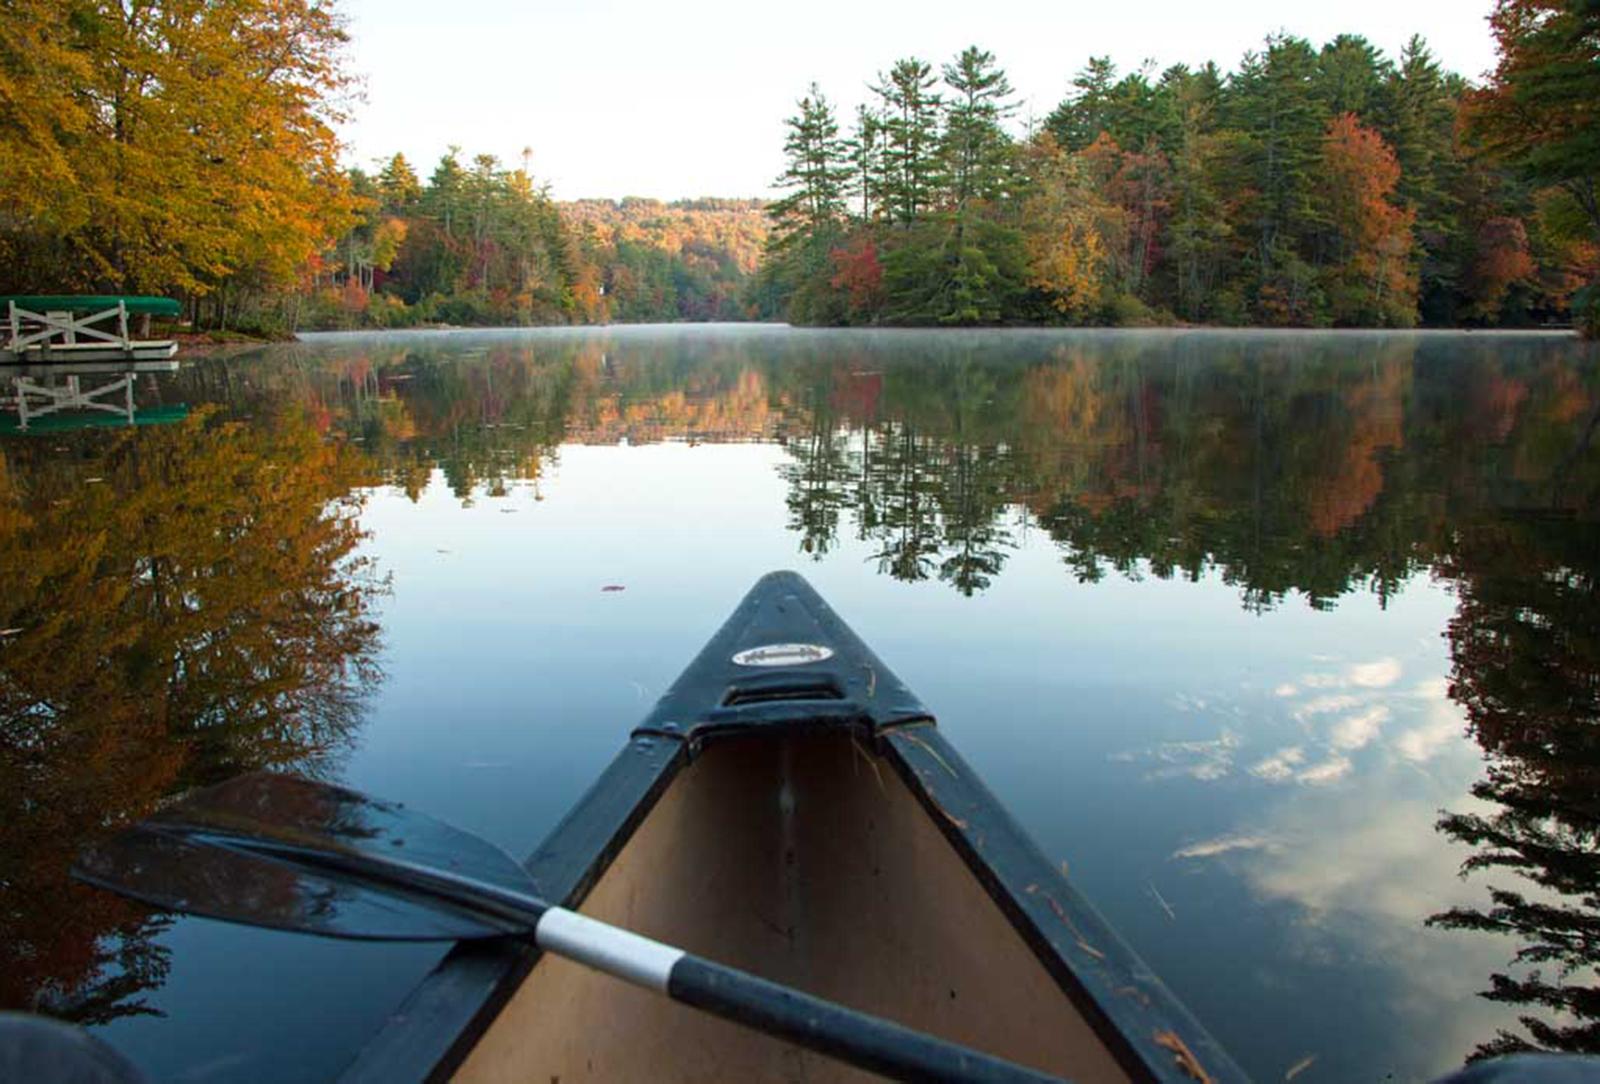 bow-of-canoe-lake-sequoyah-highlands-chamber-of-commerce-cynthia-strain